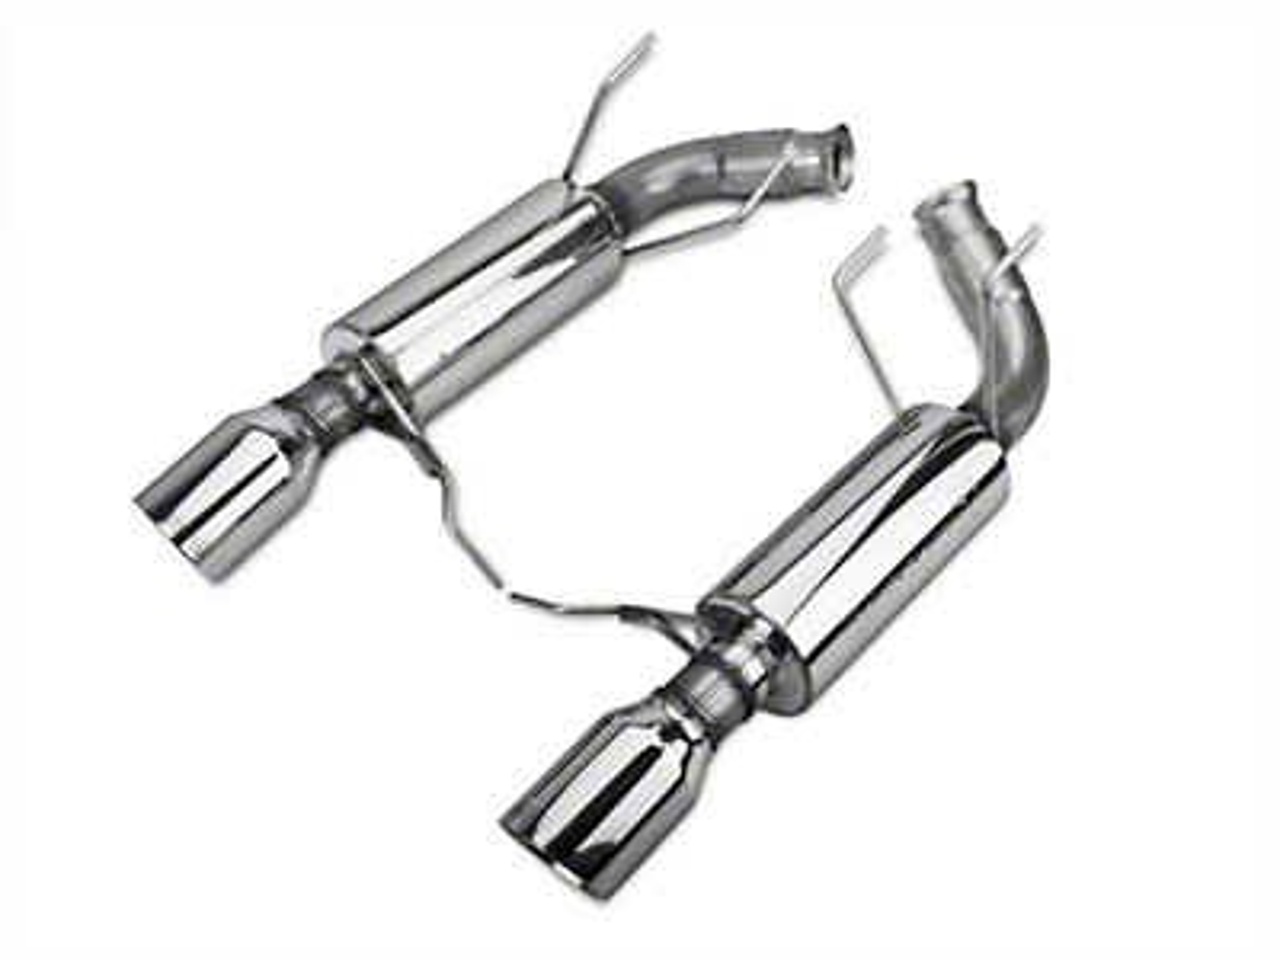 Bassani Axle-Back Exhaust (11-14 V6)